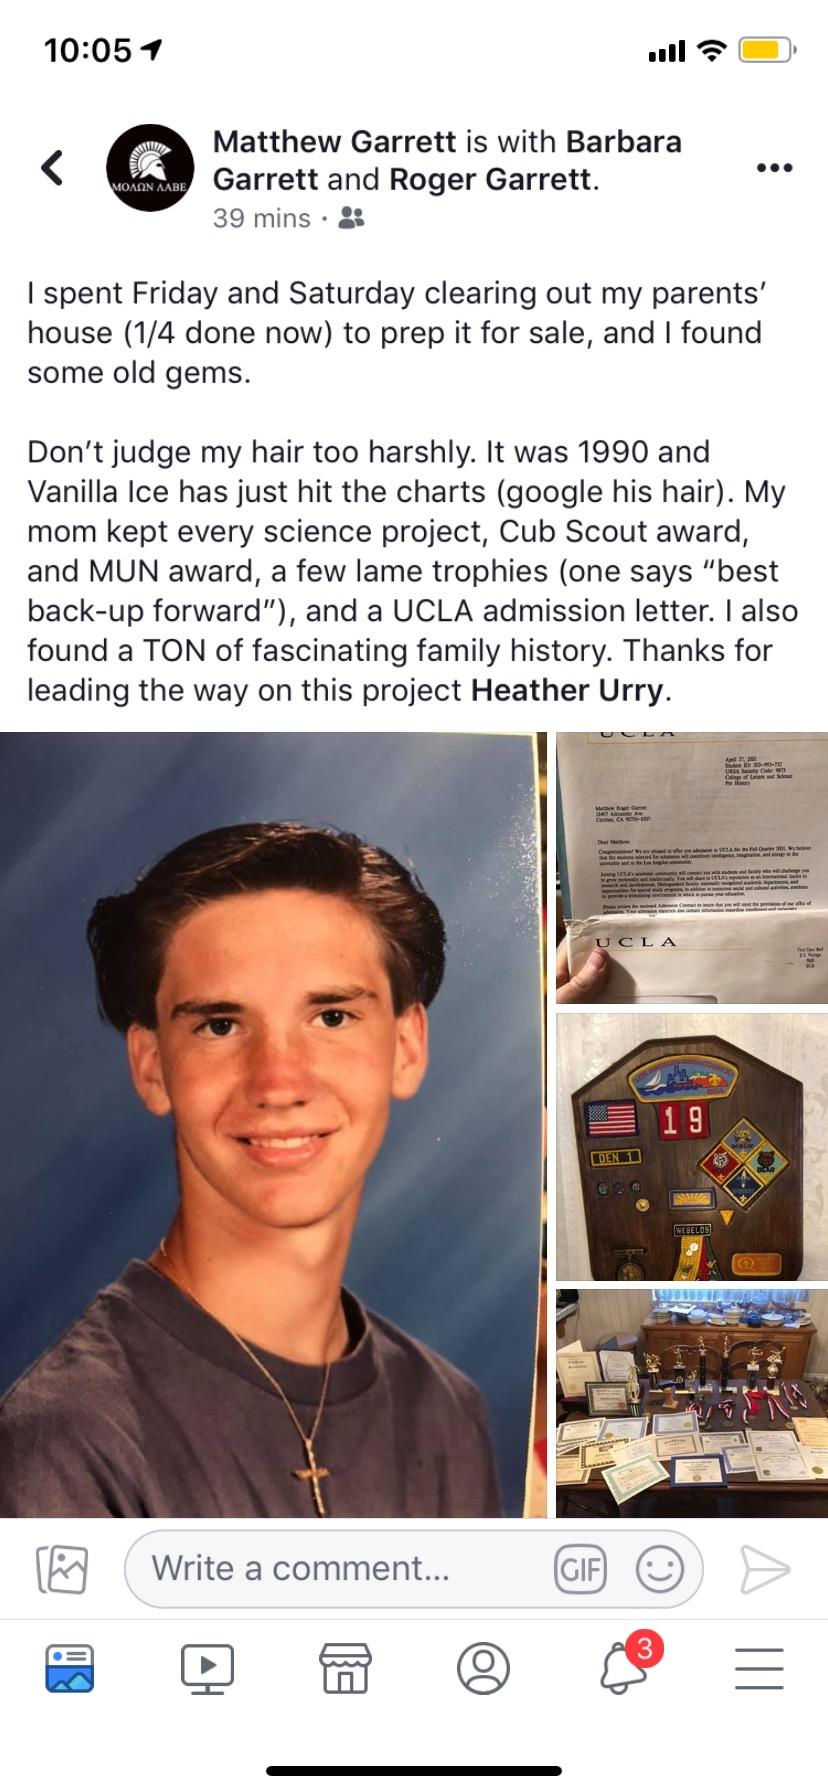 Matt Garret's post about having Vanilla Ice hair in high school